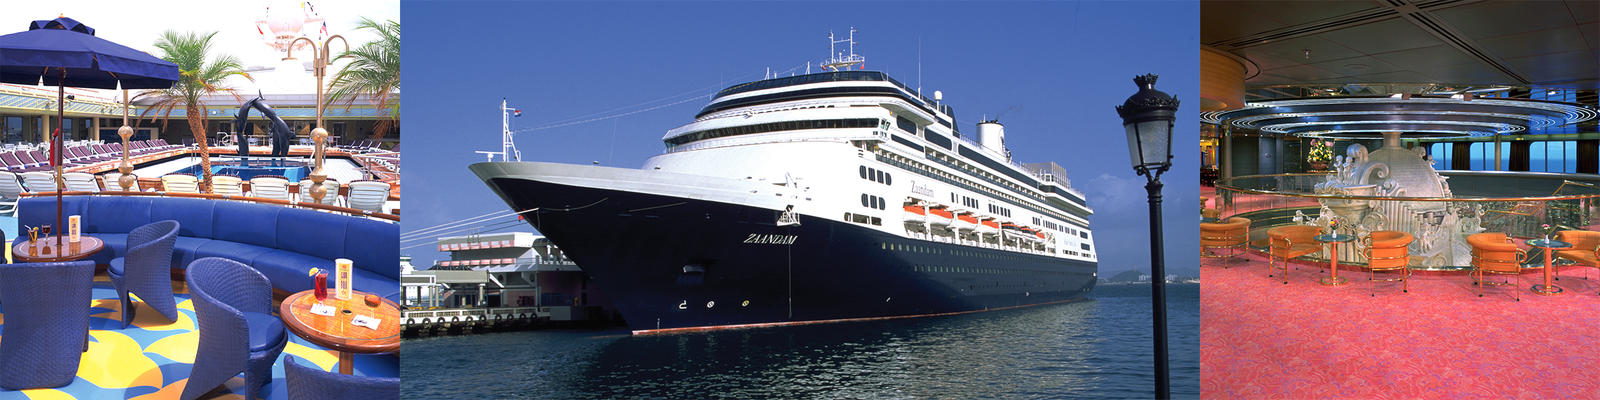 Holland America Zaandam Cruise Ship Review Photos Departure - Zaandam ship